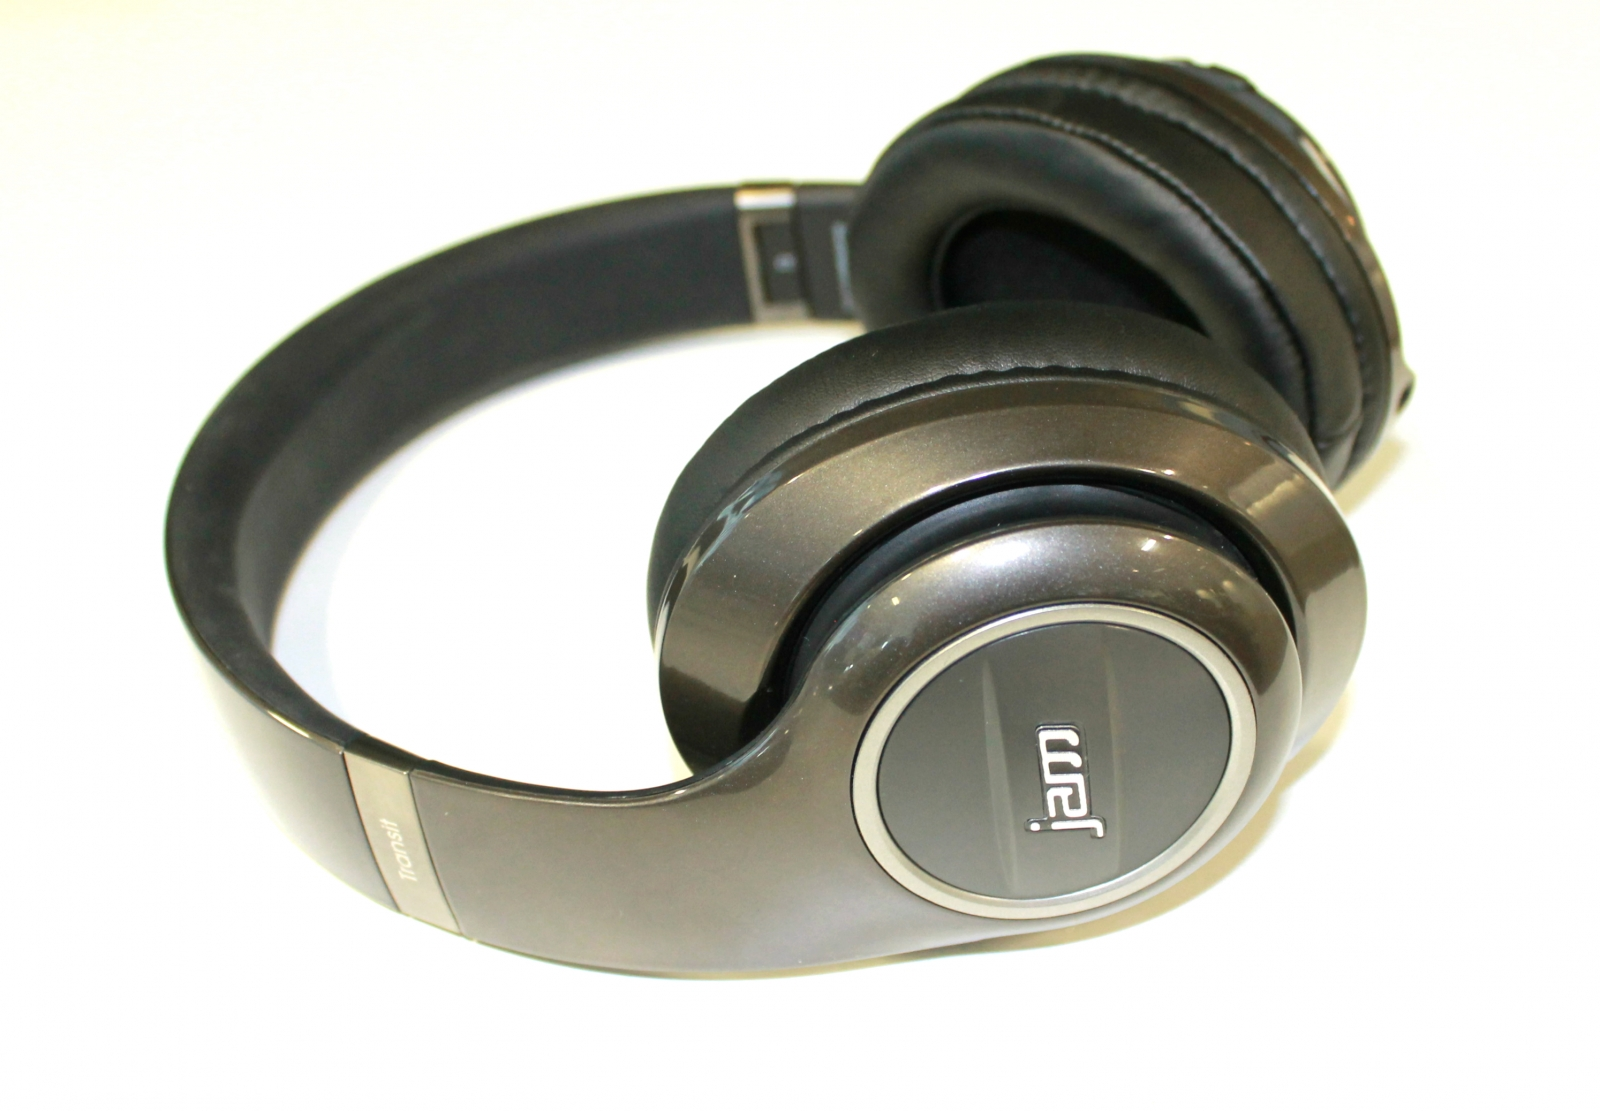 Jam transit bluetooth wireless headphones